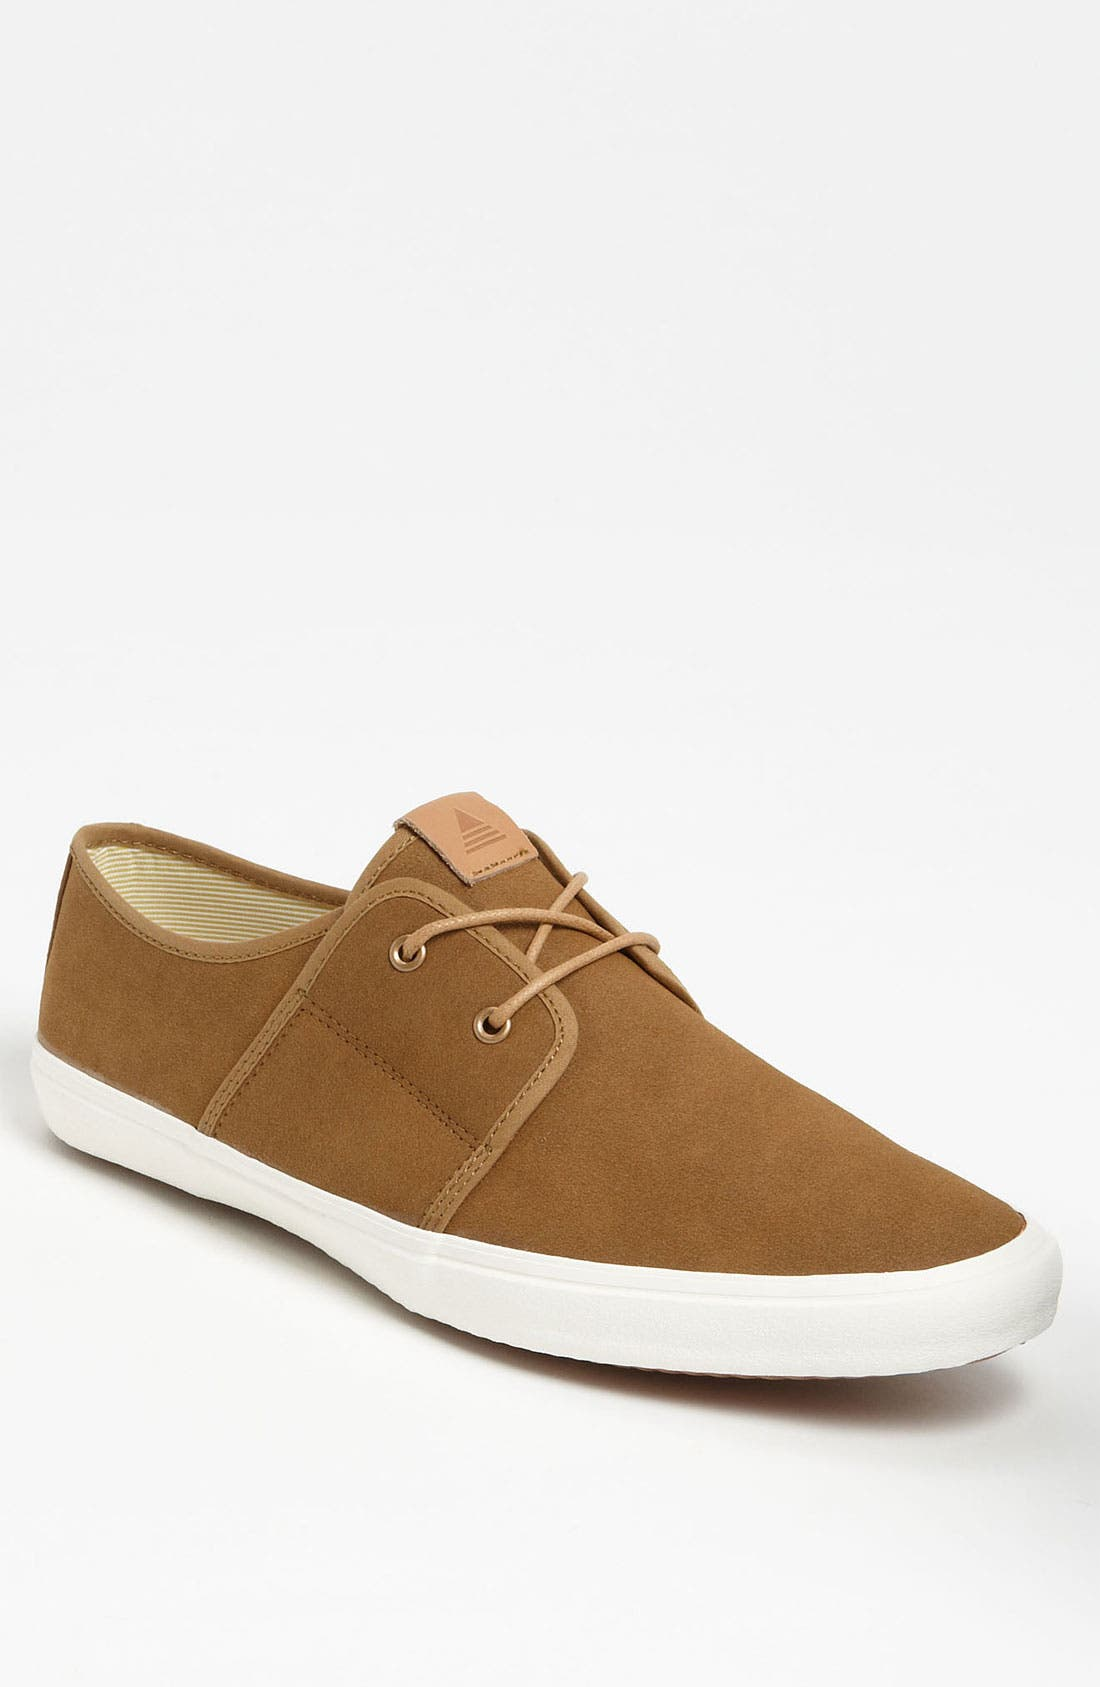 Alternate Image 1 Selected - ALDO 'Adric' Sneaker